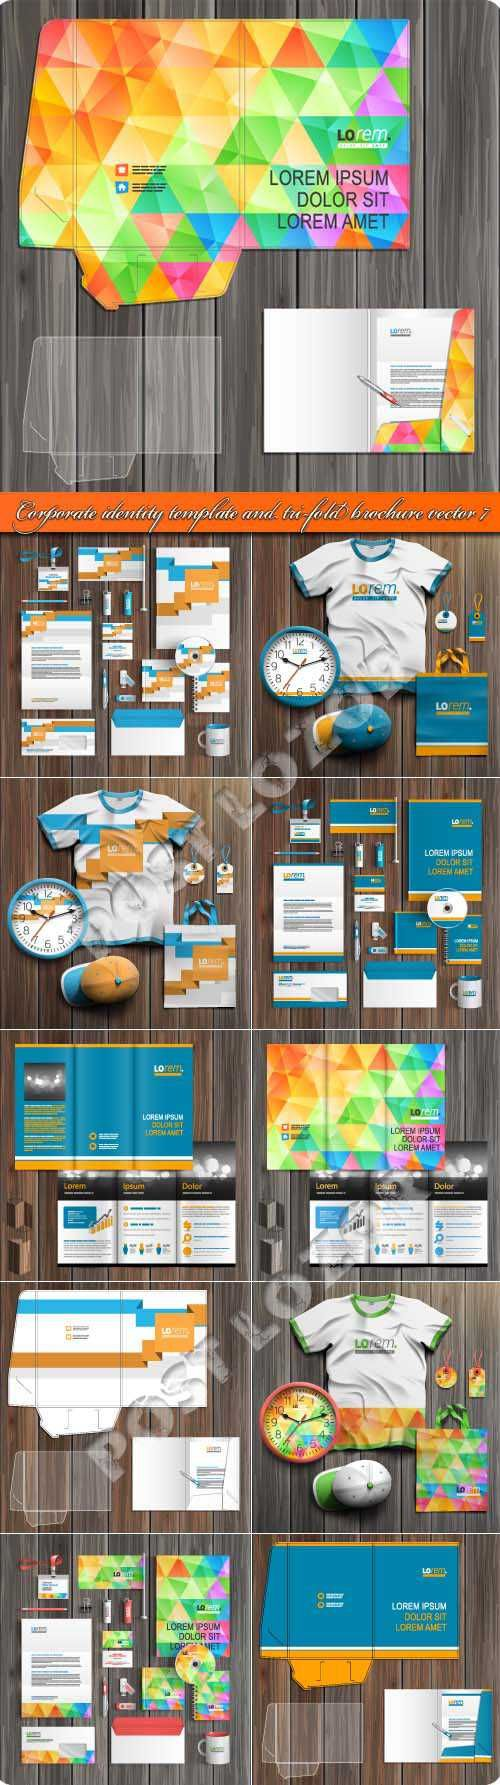 Корпоративный стиль и брошюра из трёх страниц шаблоны 7 | Corporate identity template and tri-fold brochure vector 7